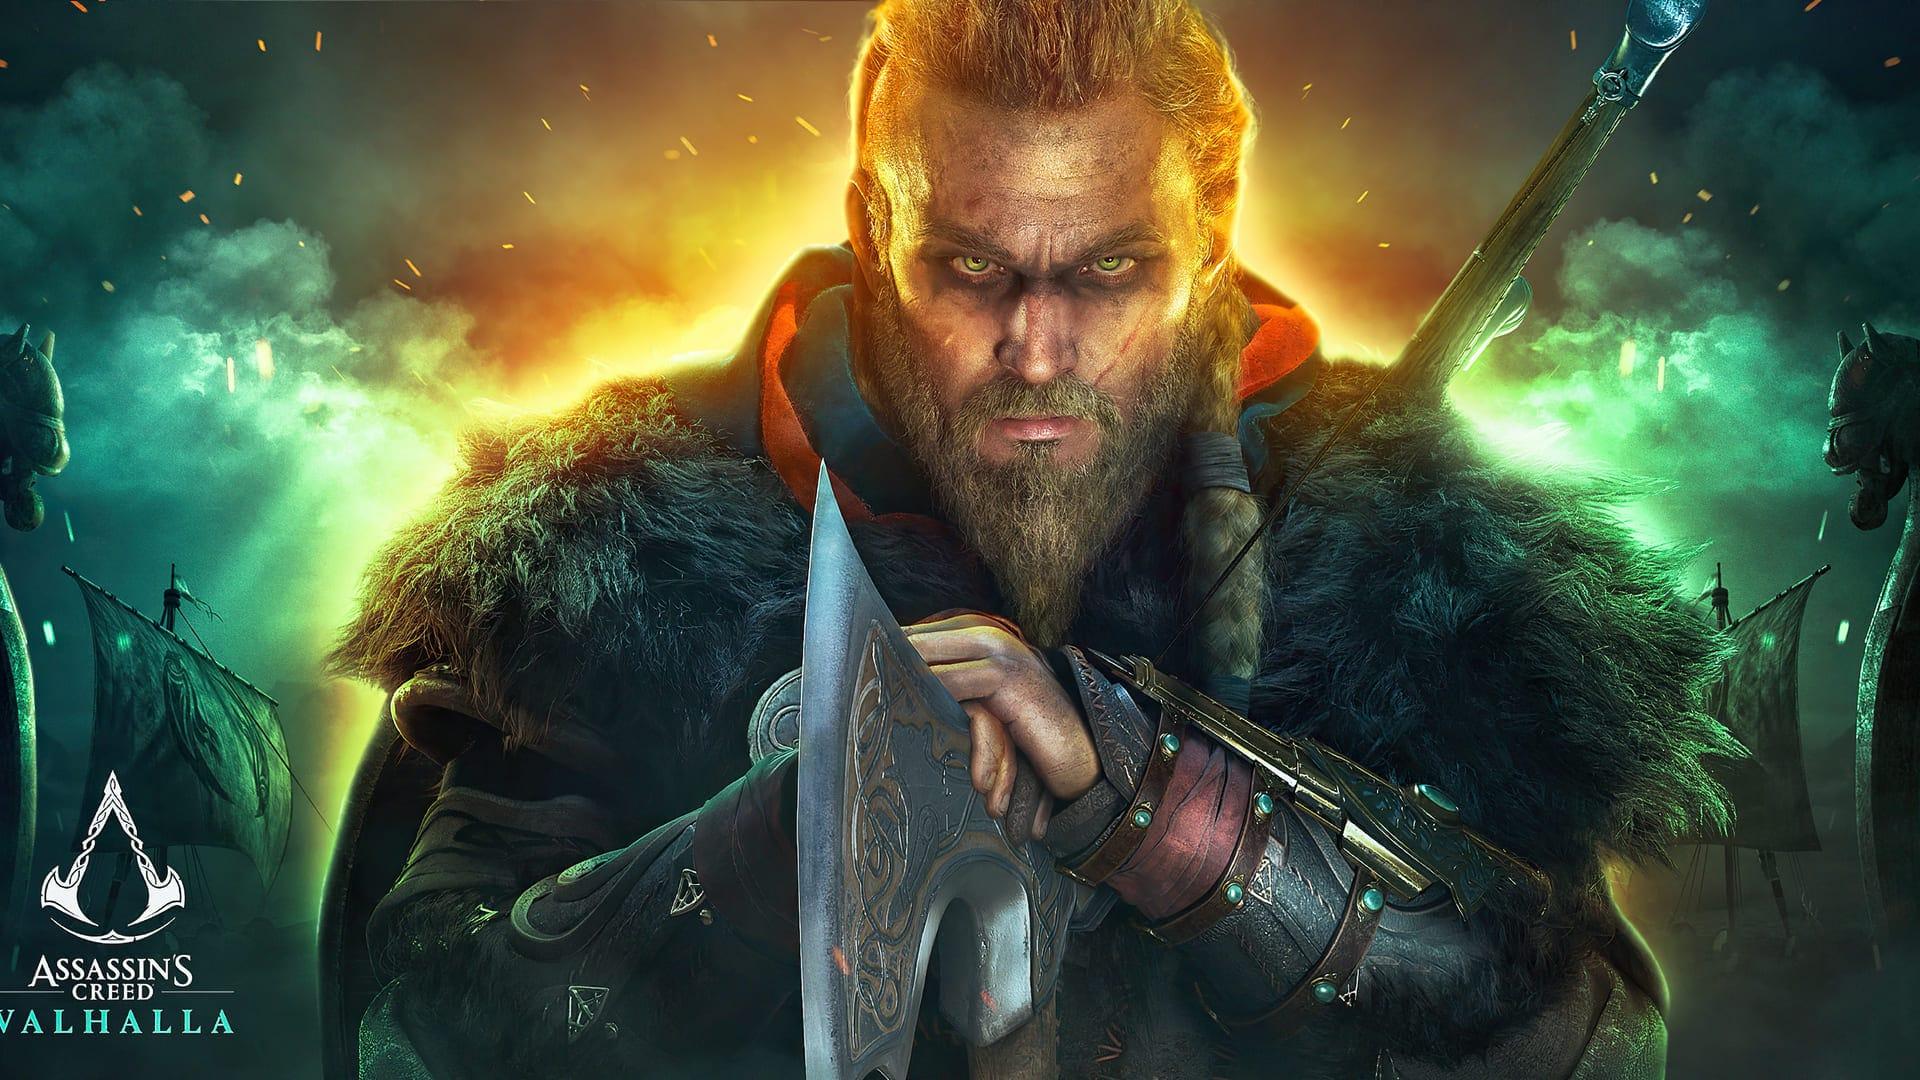 Assassins-Creed-Valhalla-Review Ubisoft GamersRD